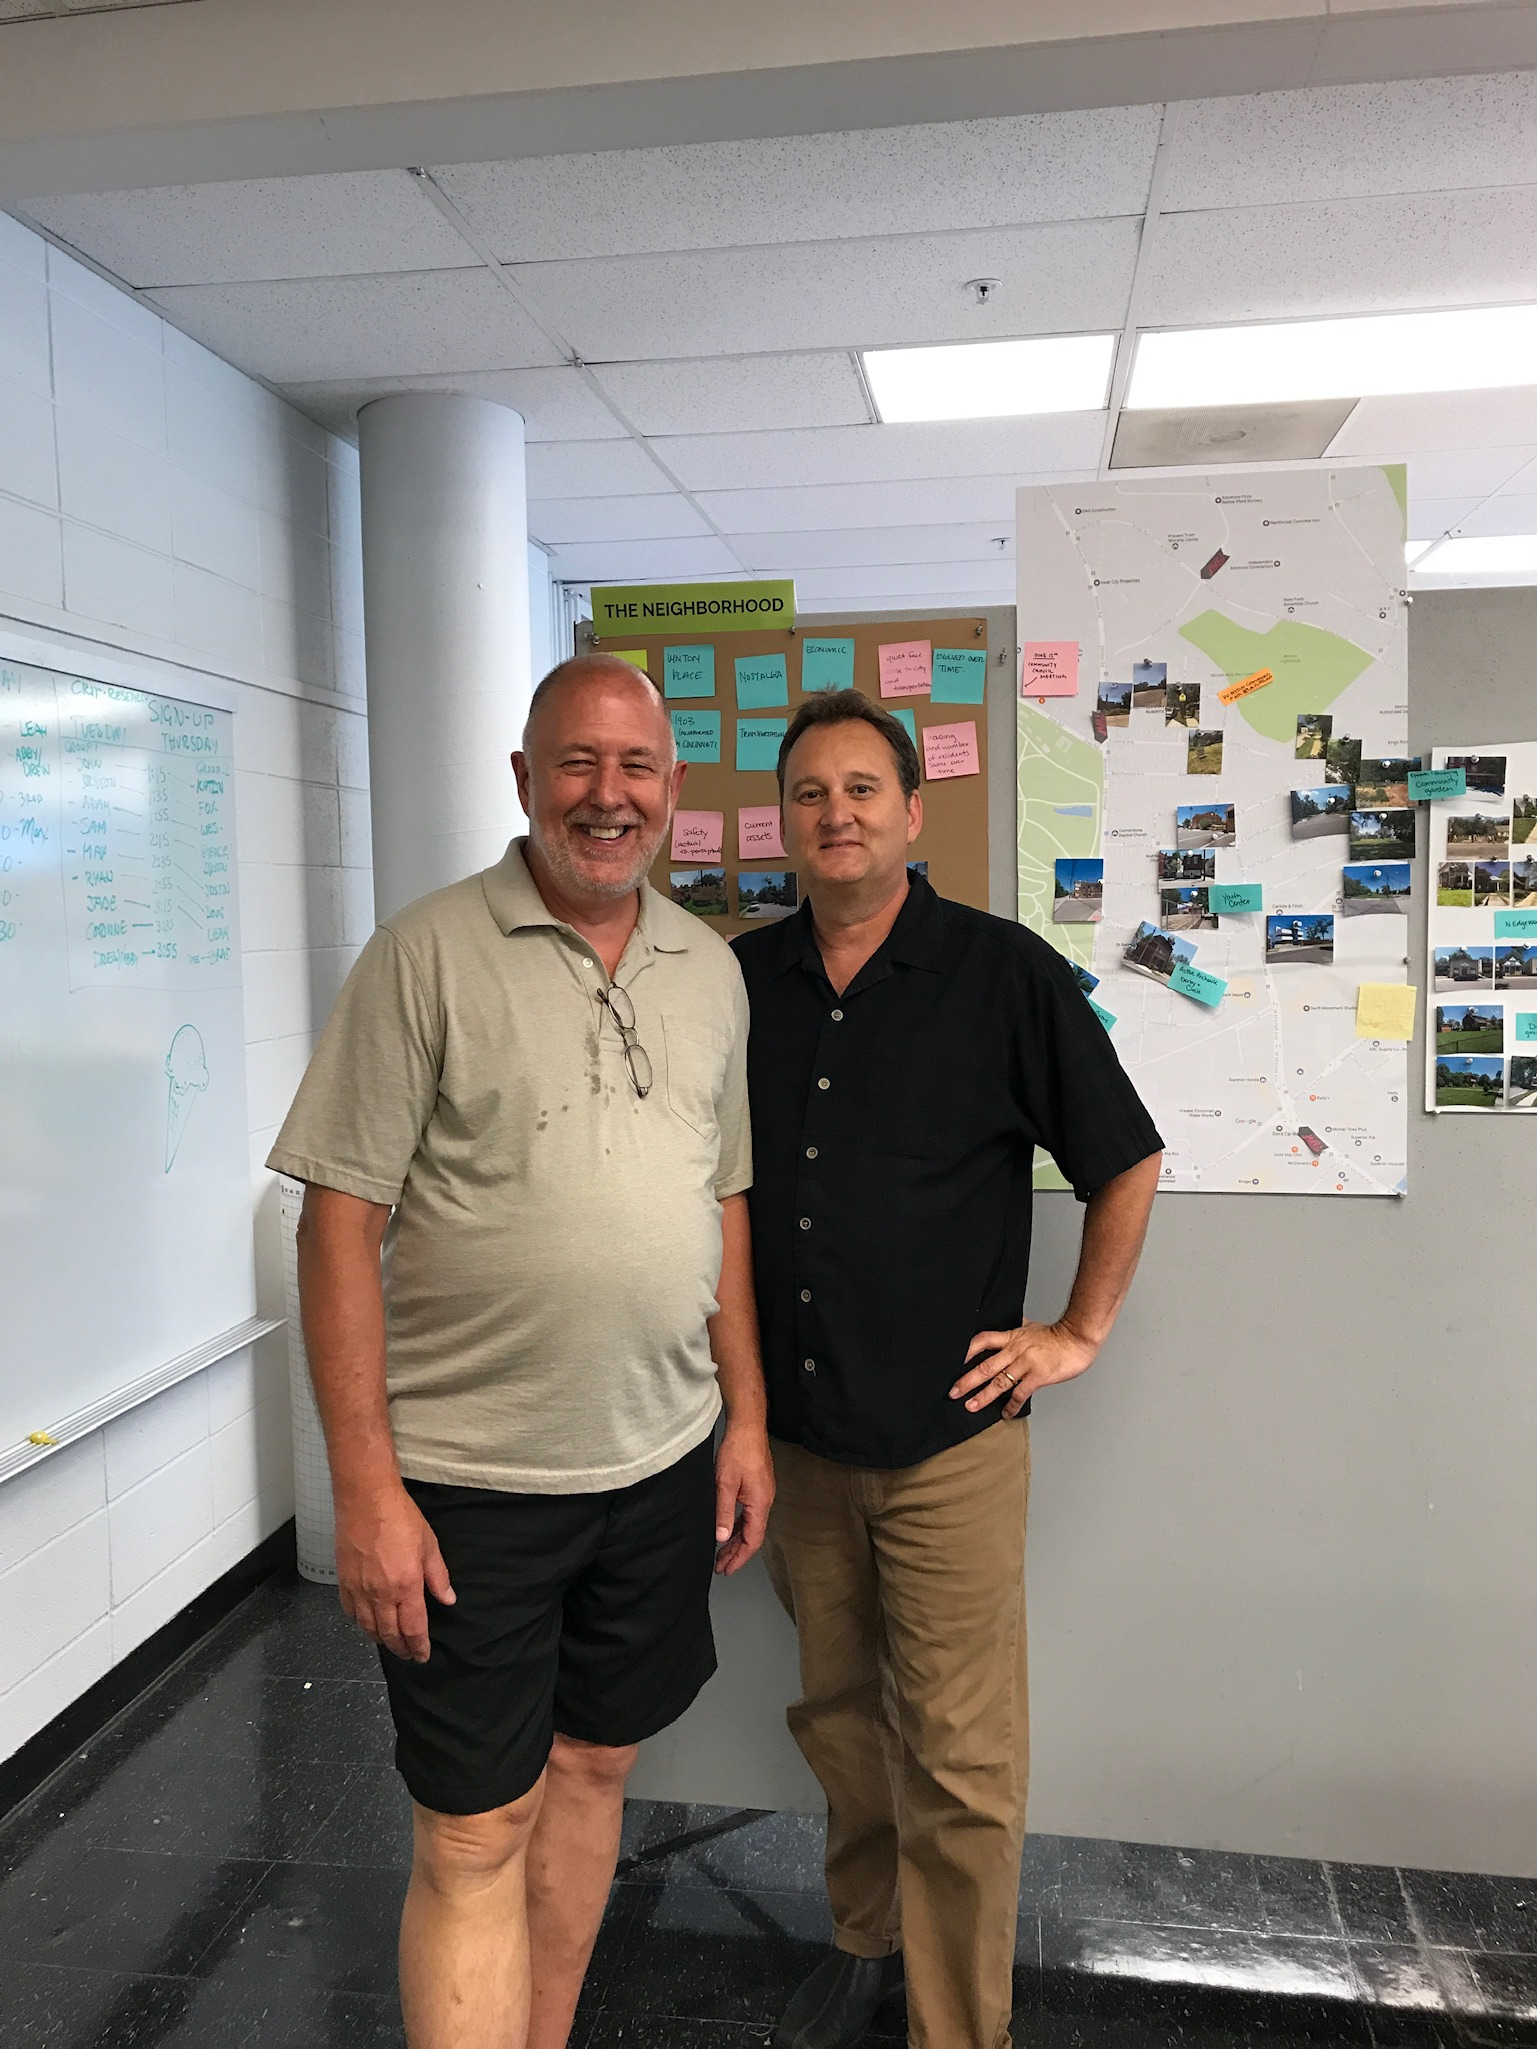 Gary Robbins, SGV Council President & Steve Doehler, Professor of Industrial Design at University of Cincinnati.